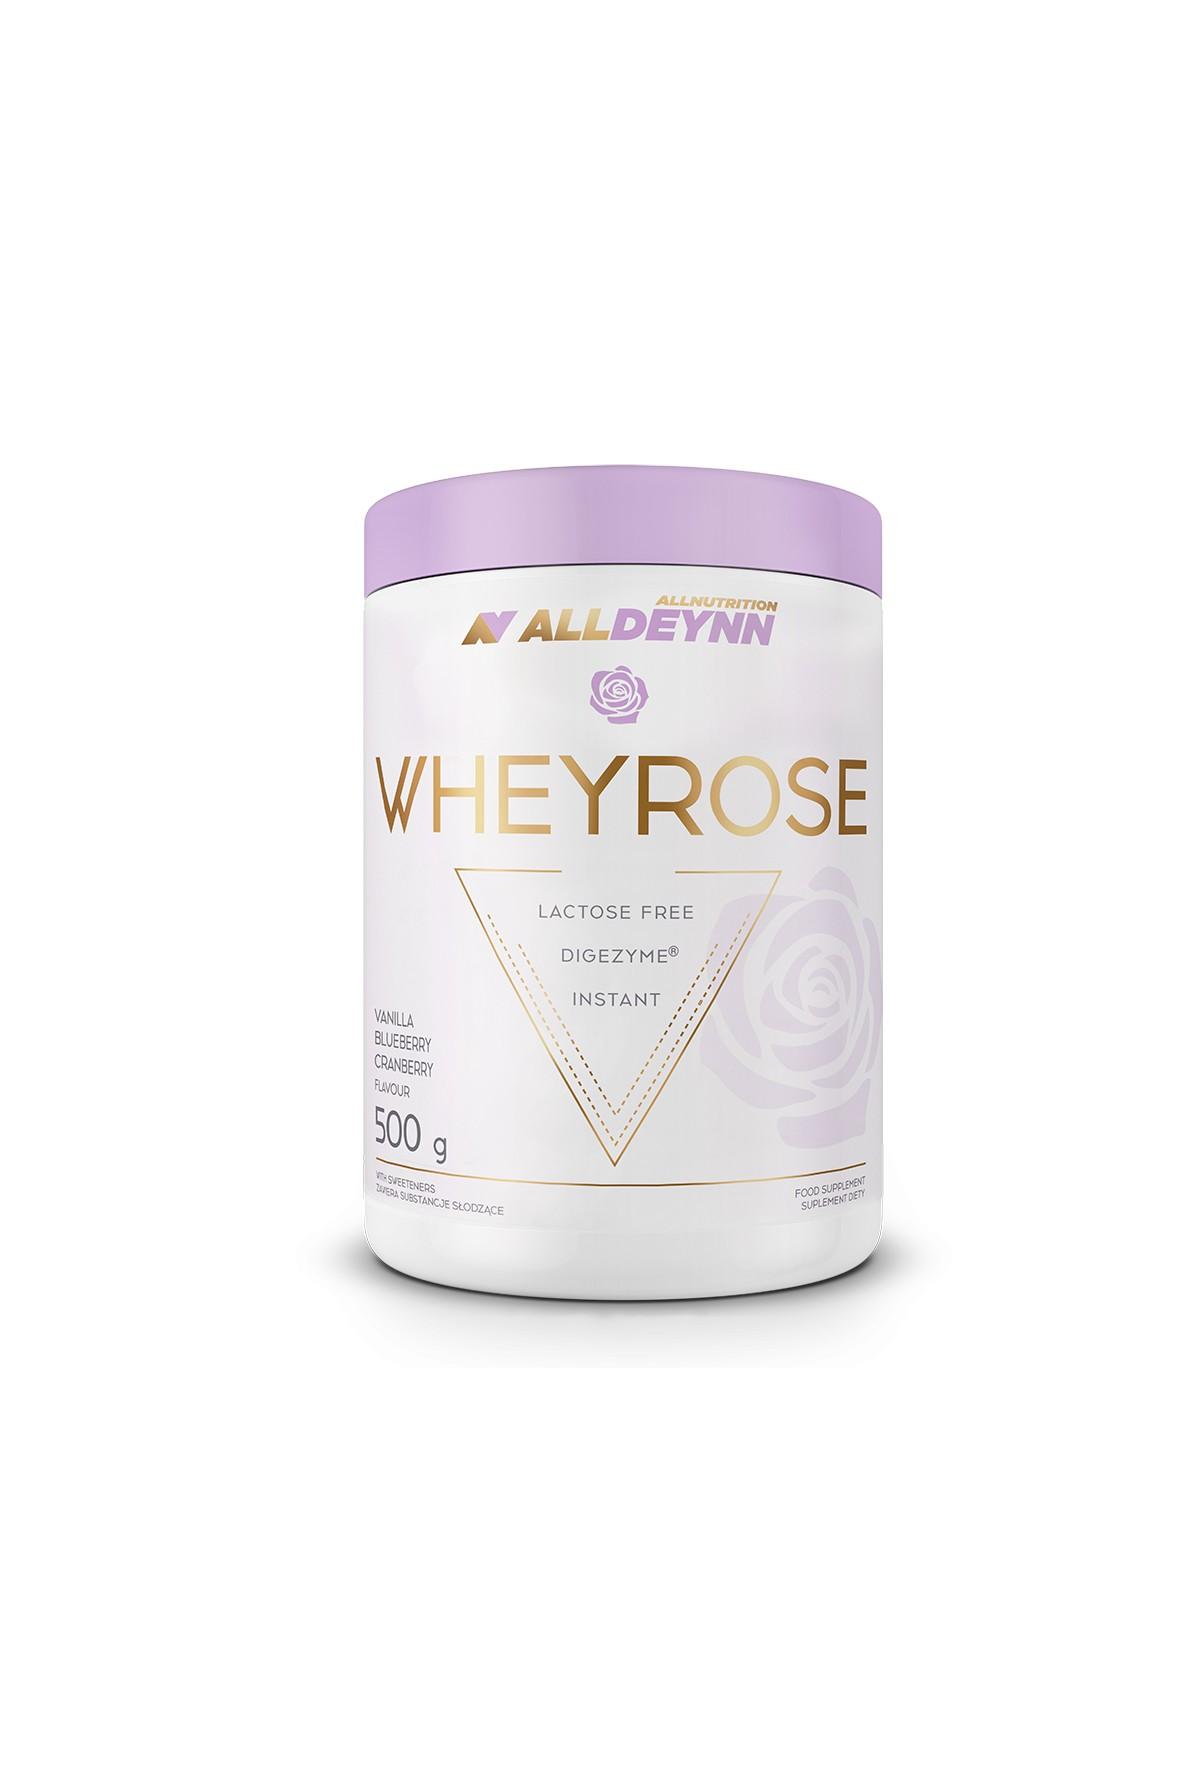 Suplementy diety - Allnutrition ALLDEYNN Wheyrose Vanilla Blueberry Cranberry 500 g